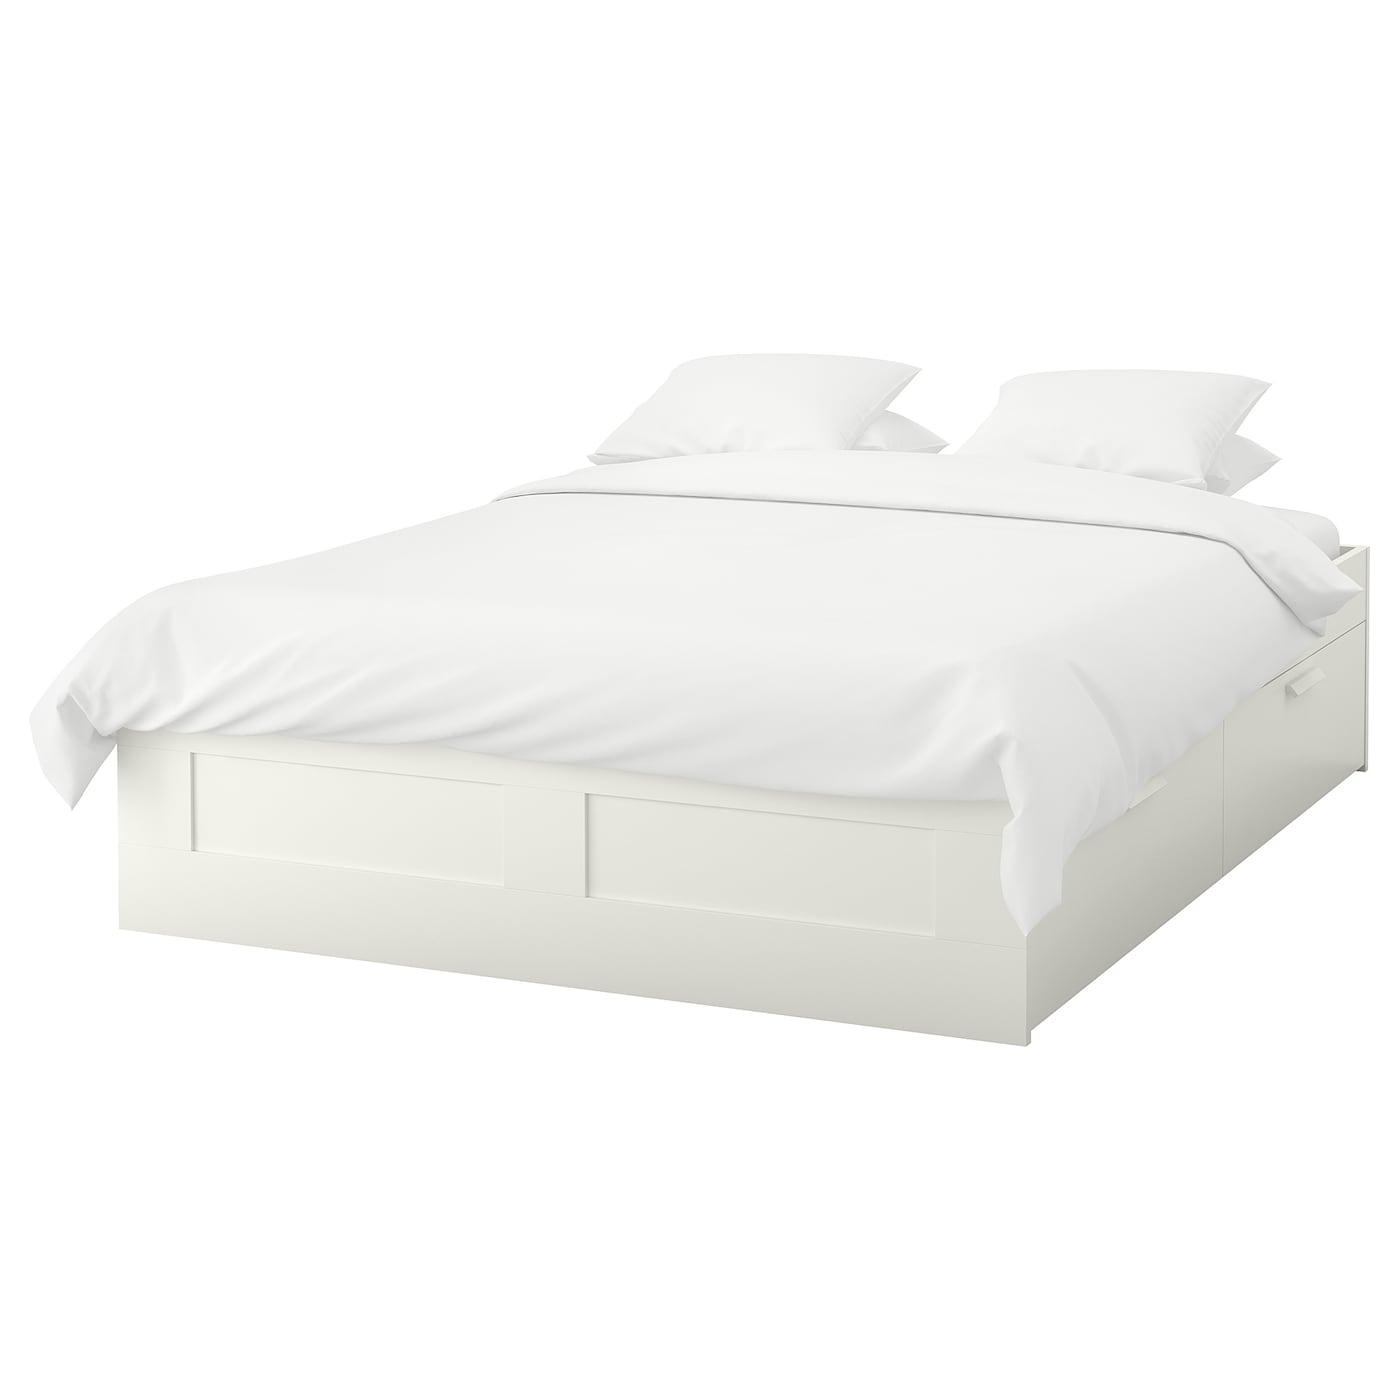 brimnes cadre lit avec rangement blanc leirsund 160x200 cm. Black Bedroom Furniture Sets. Home Design Ideas